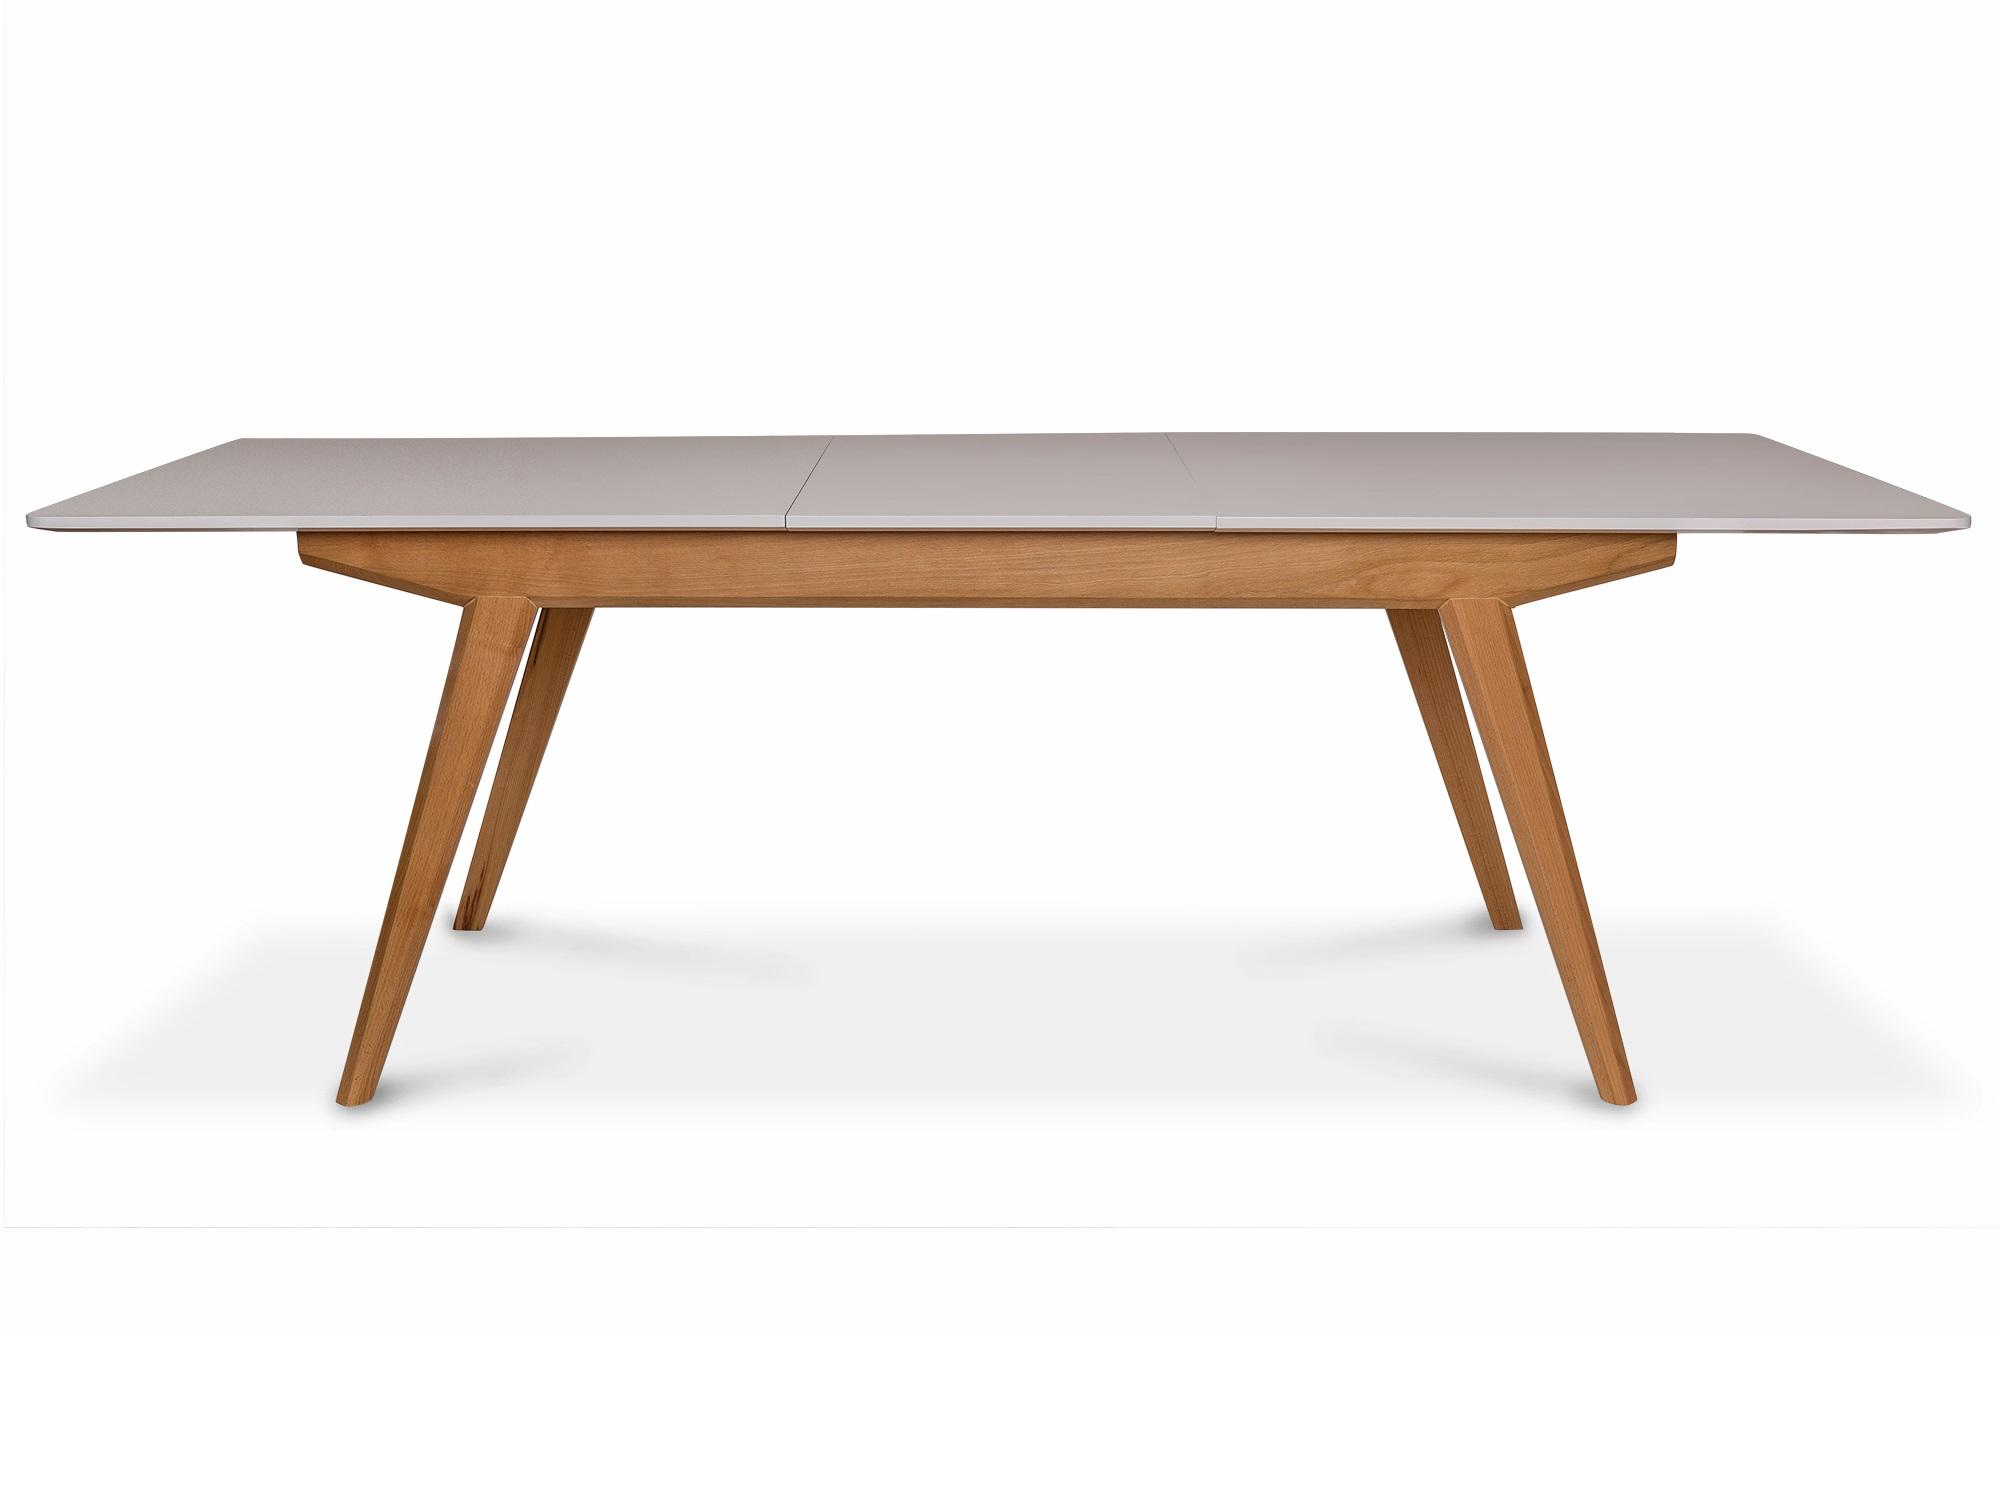 Кухонный стол MyFurnish 15432973 от thefurnish